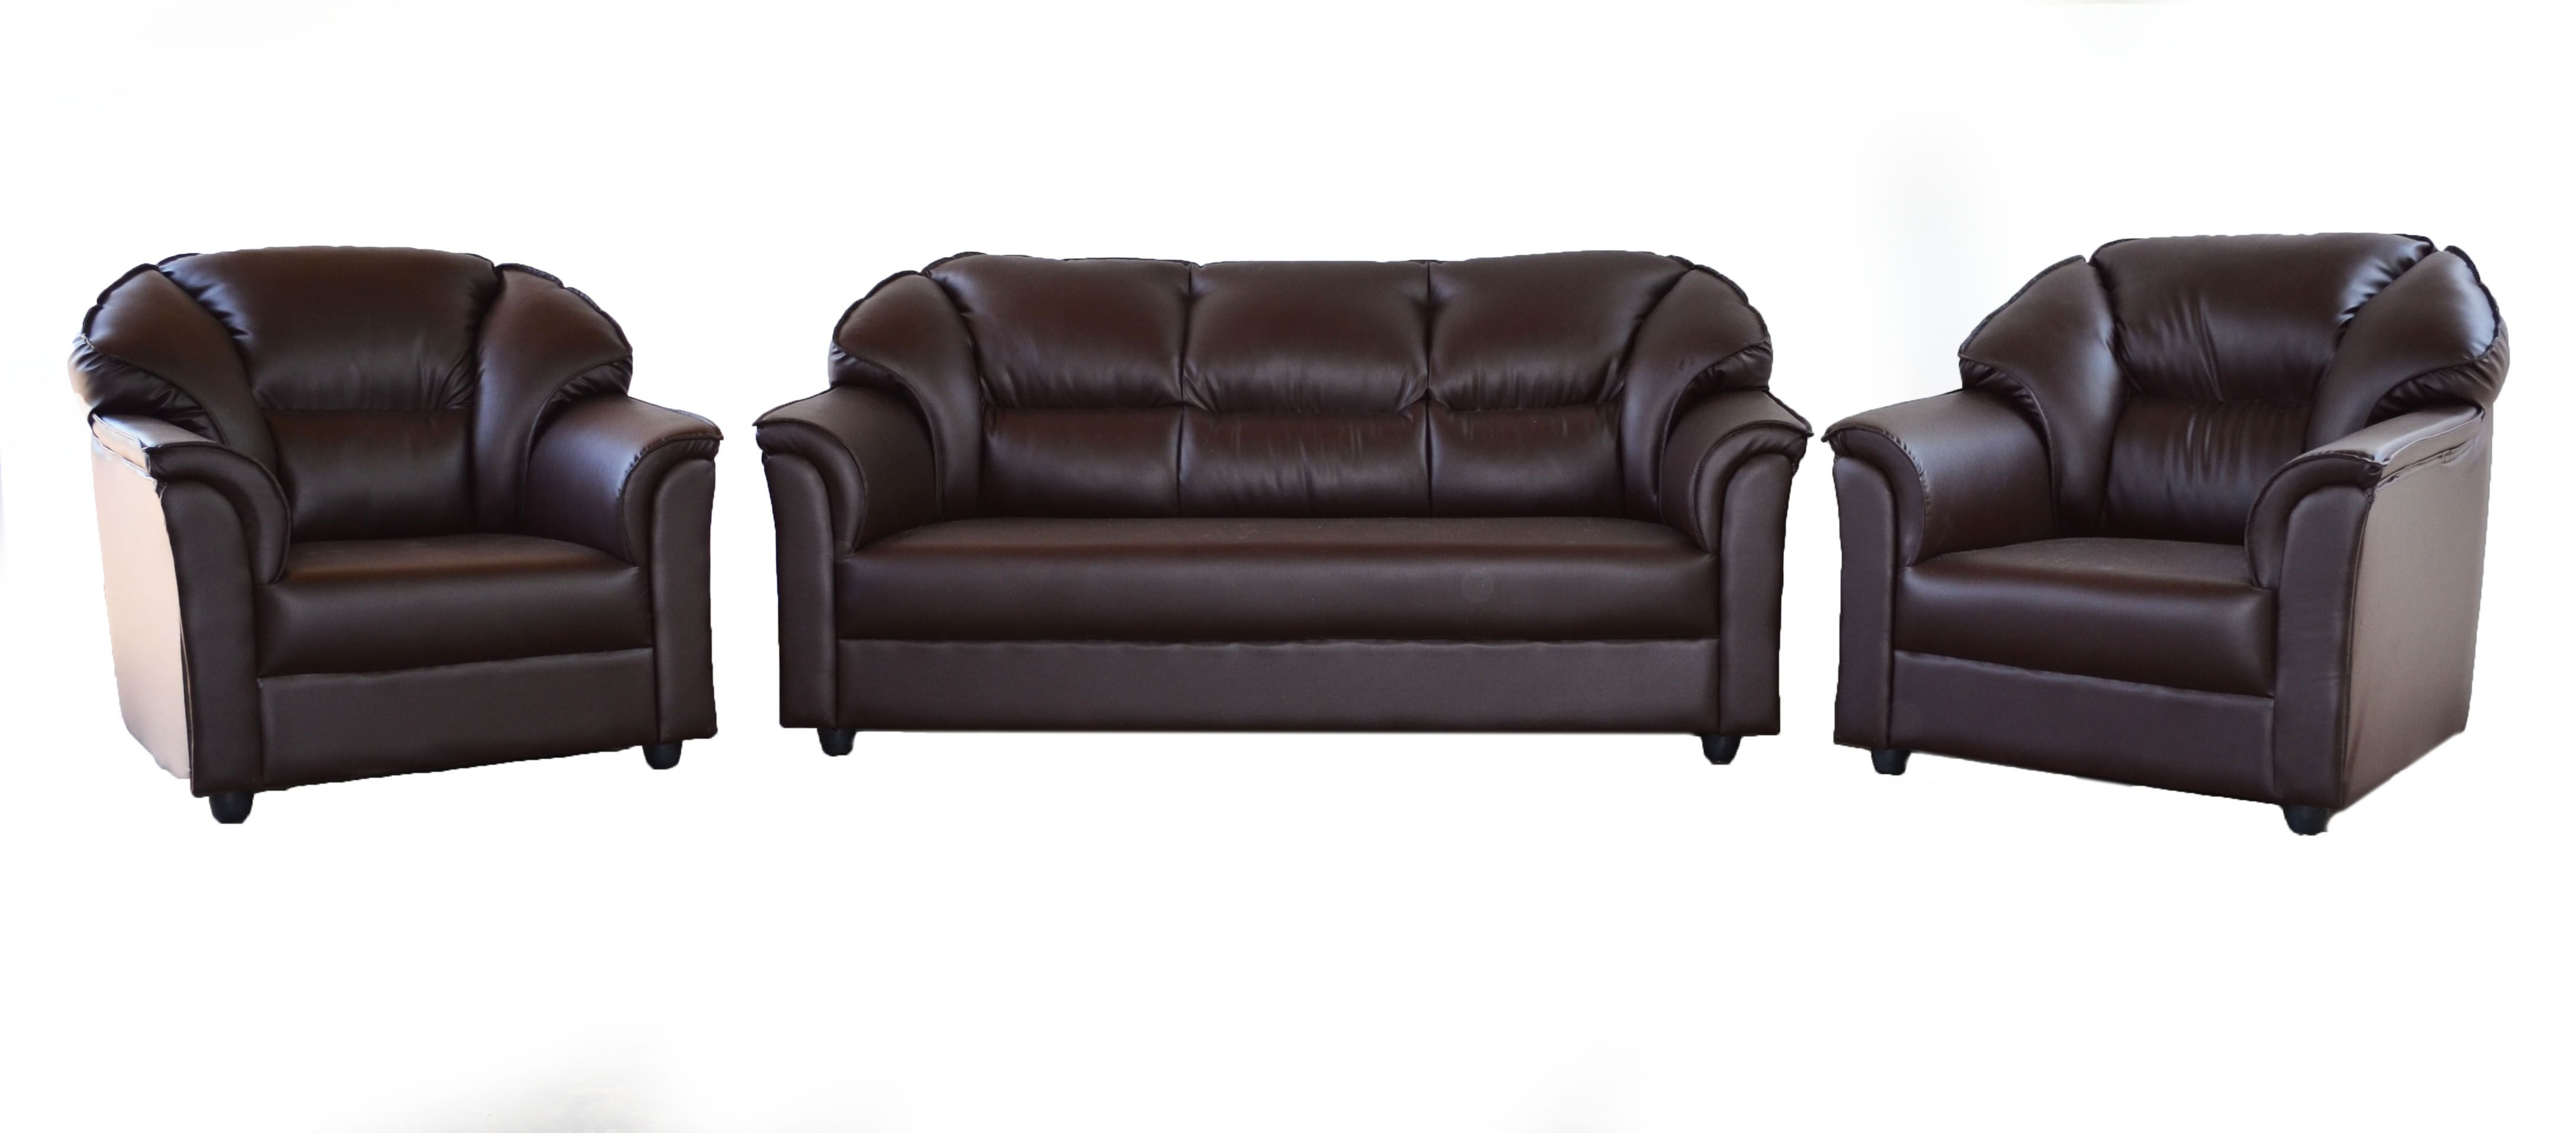 westido manhattan brown 3 1 seater sofa set MZTOEHT